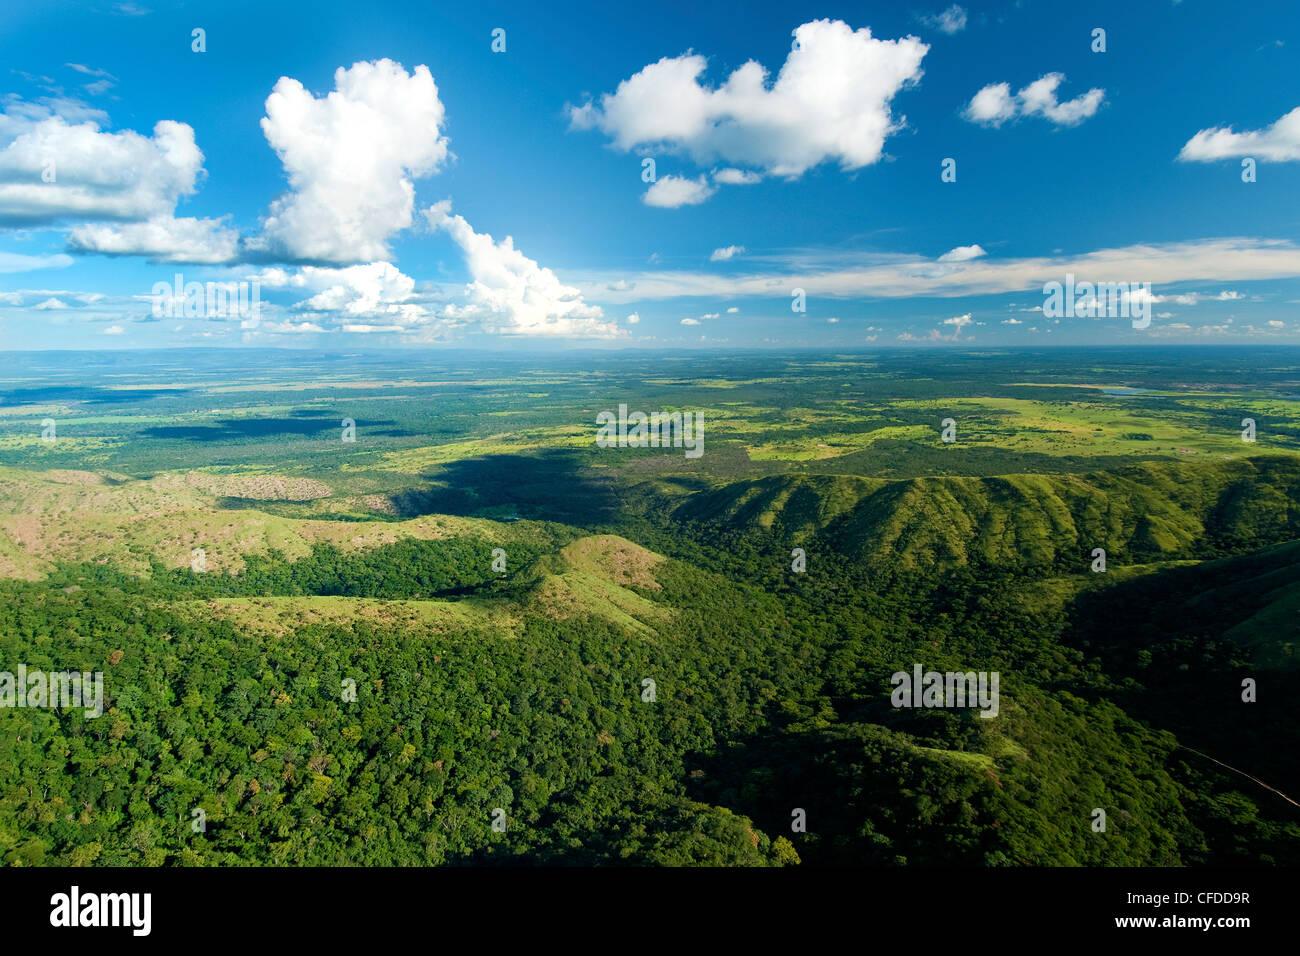 Chapada dos Guimaraes National Park, Pantanal, Southwestern Brazil, South America - Stock Image